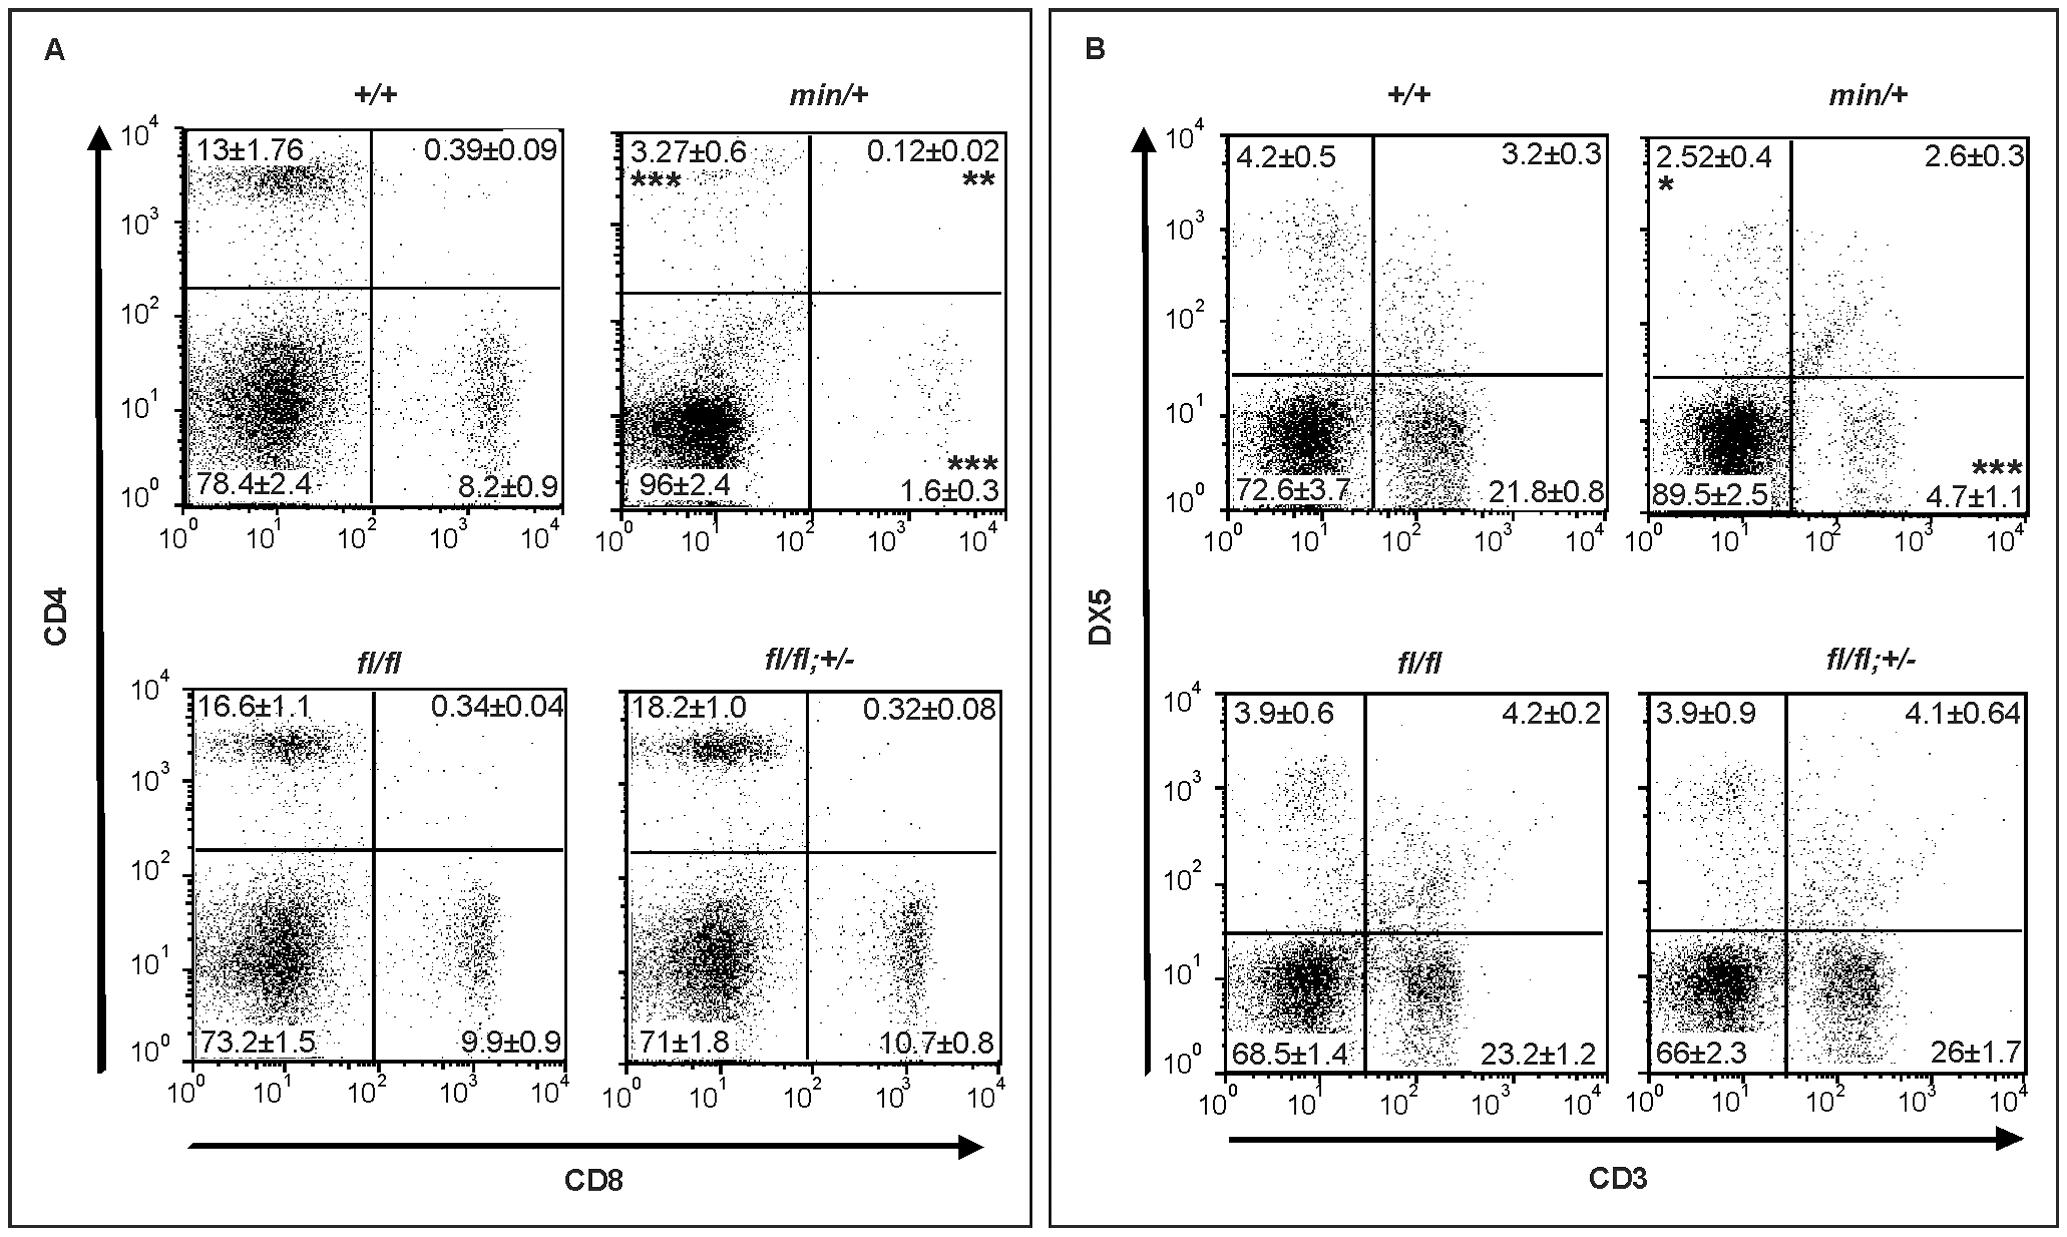 Lymphodepletion in <i>Apc</i> hypomorphic mice.